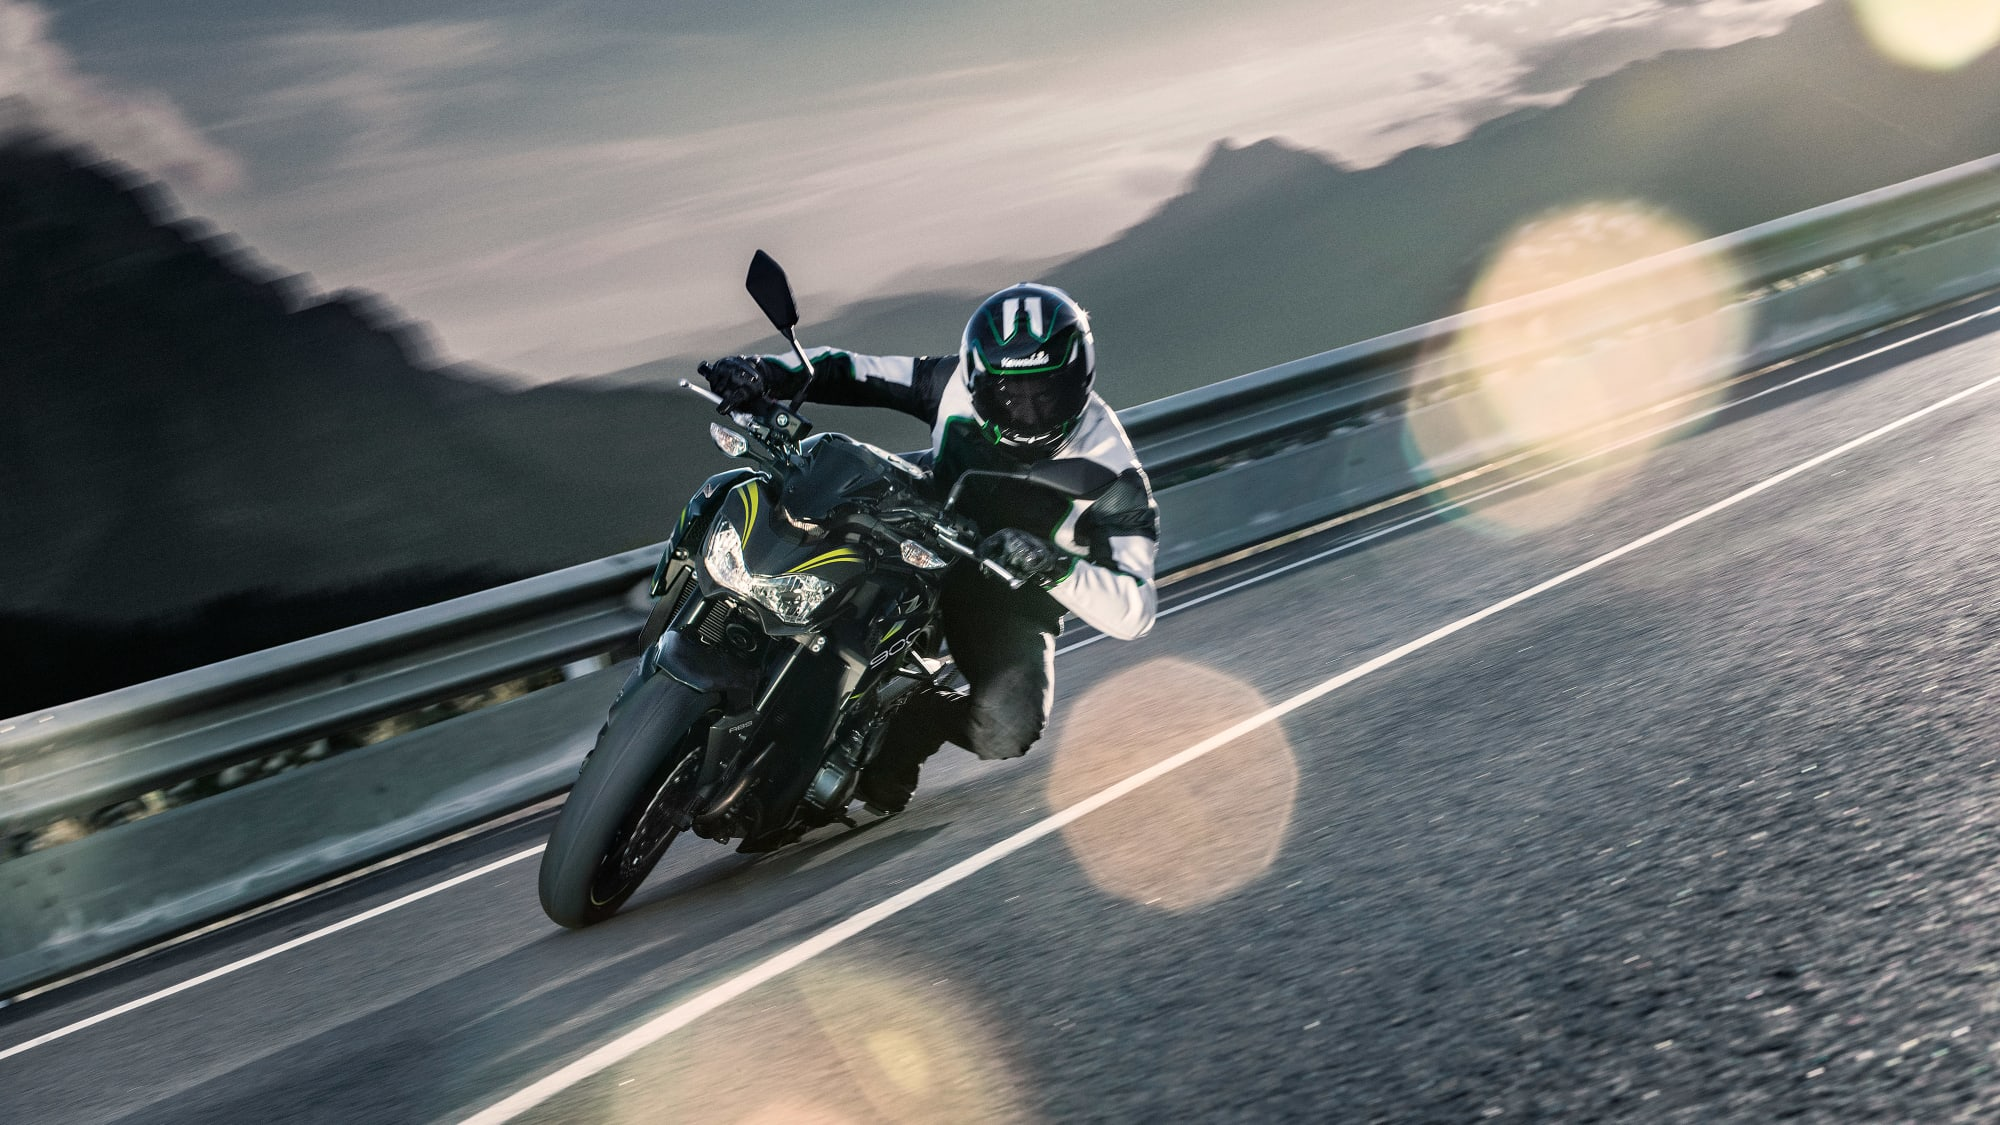 die Kawasaki Z 900 legt sich in die Kurve